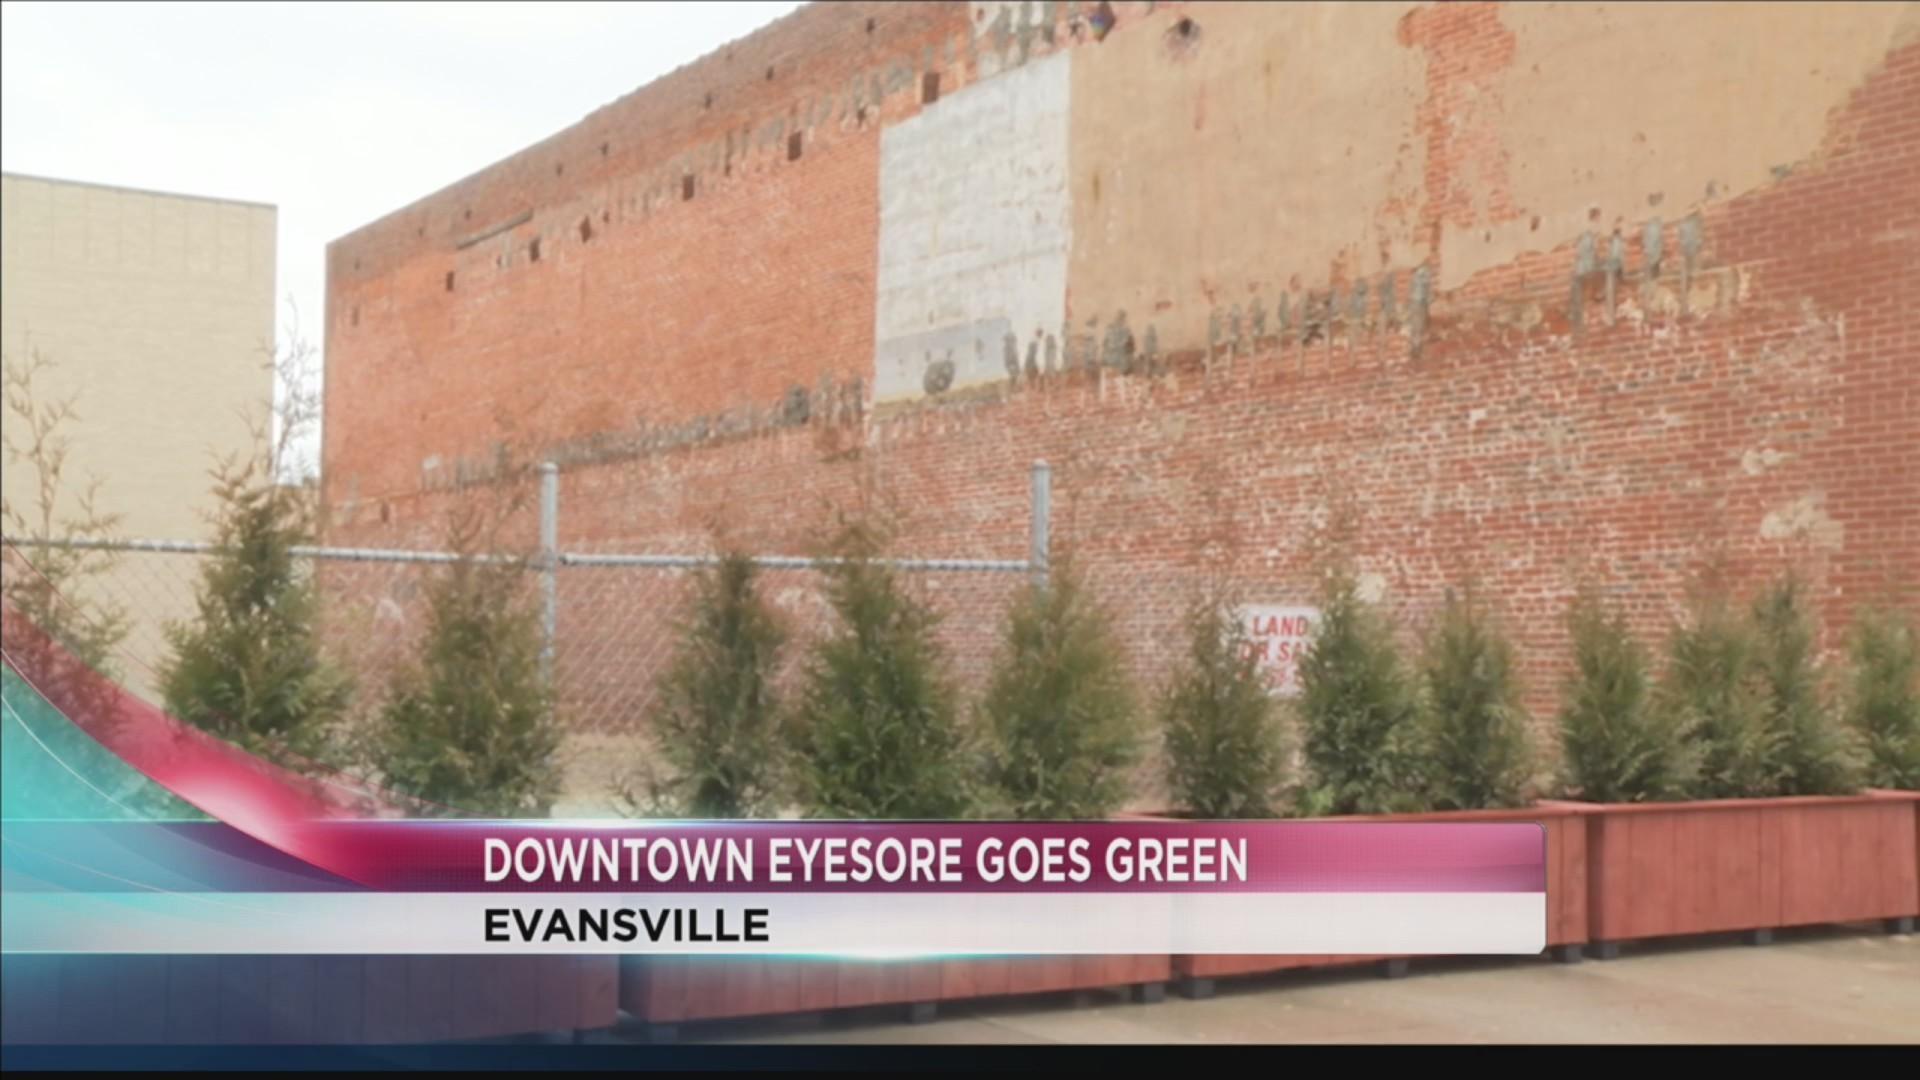 Downtown eyesore goes green